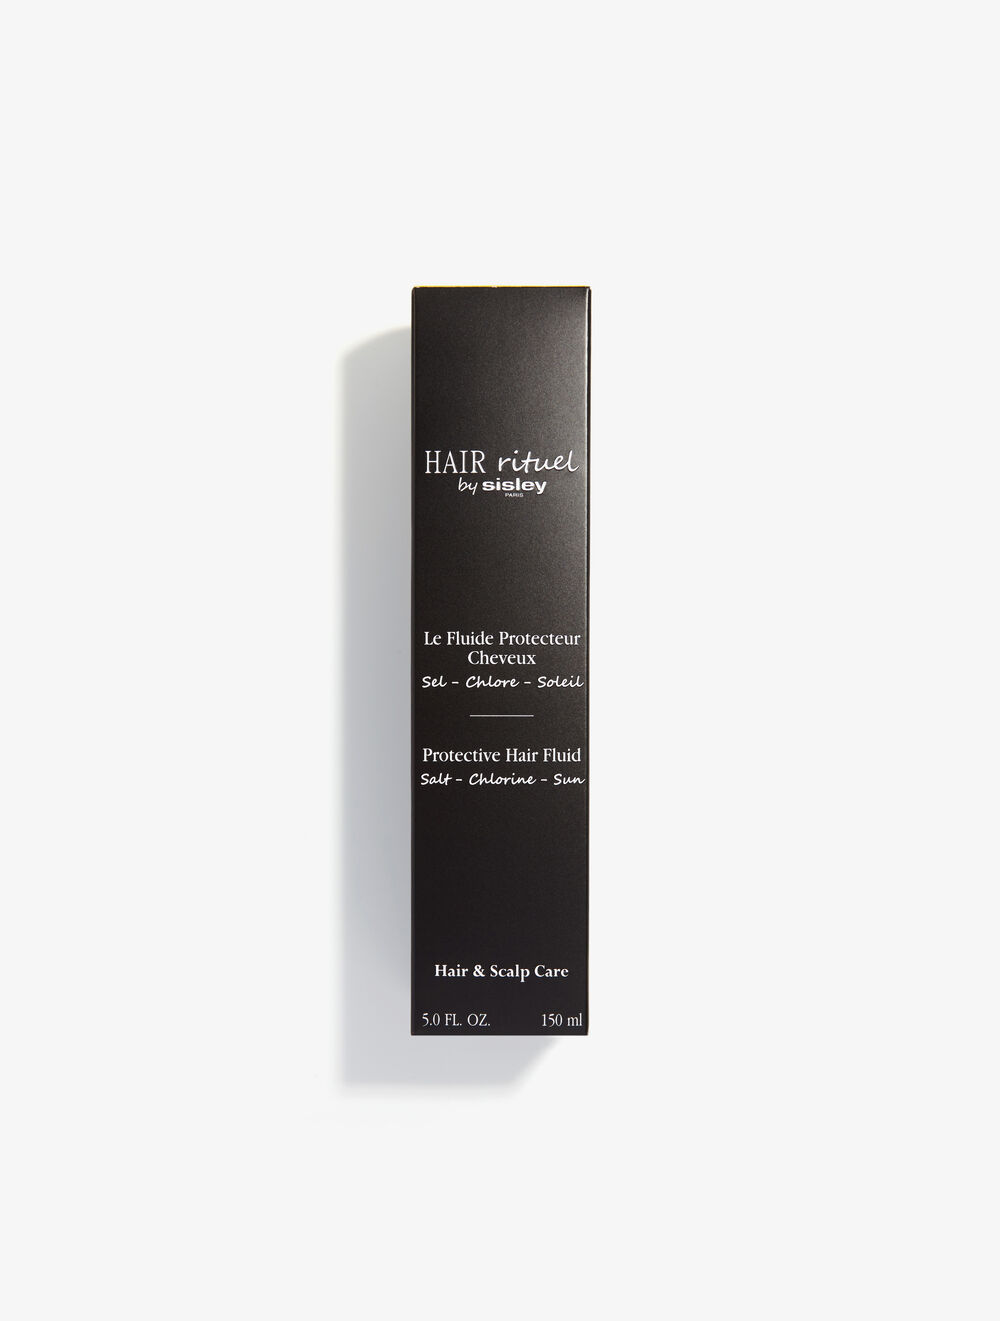 Le Spray Volume Corps & Densité